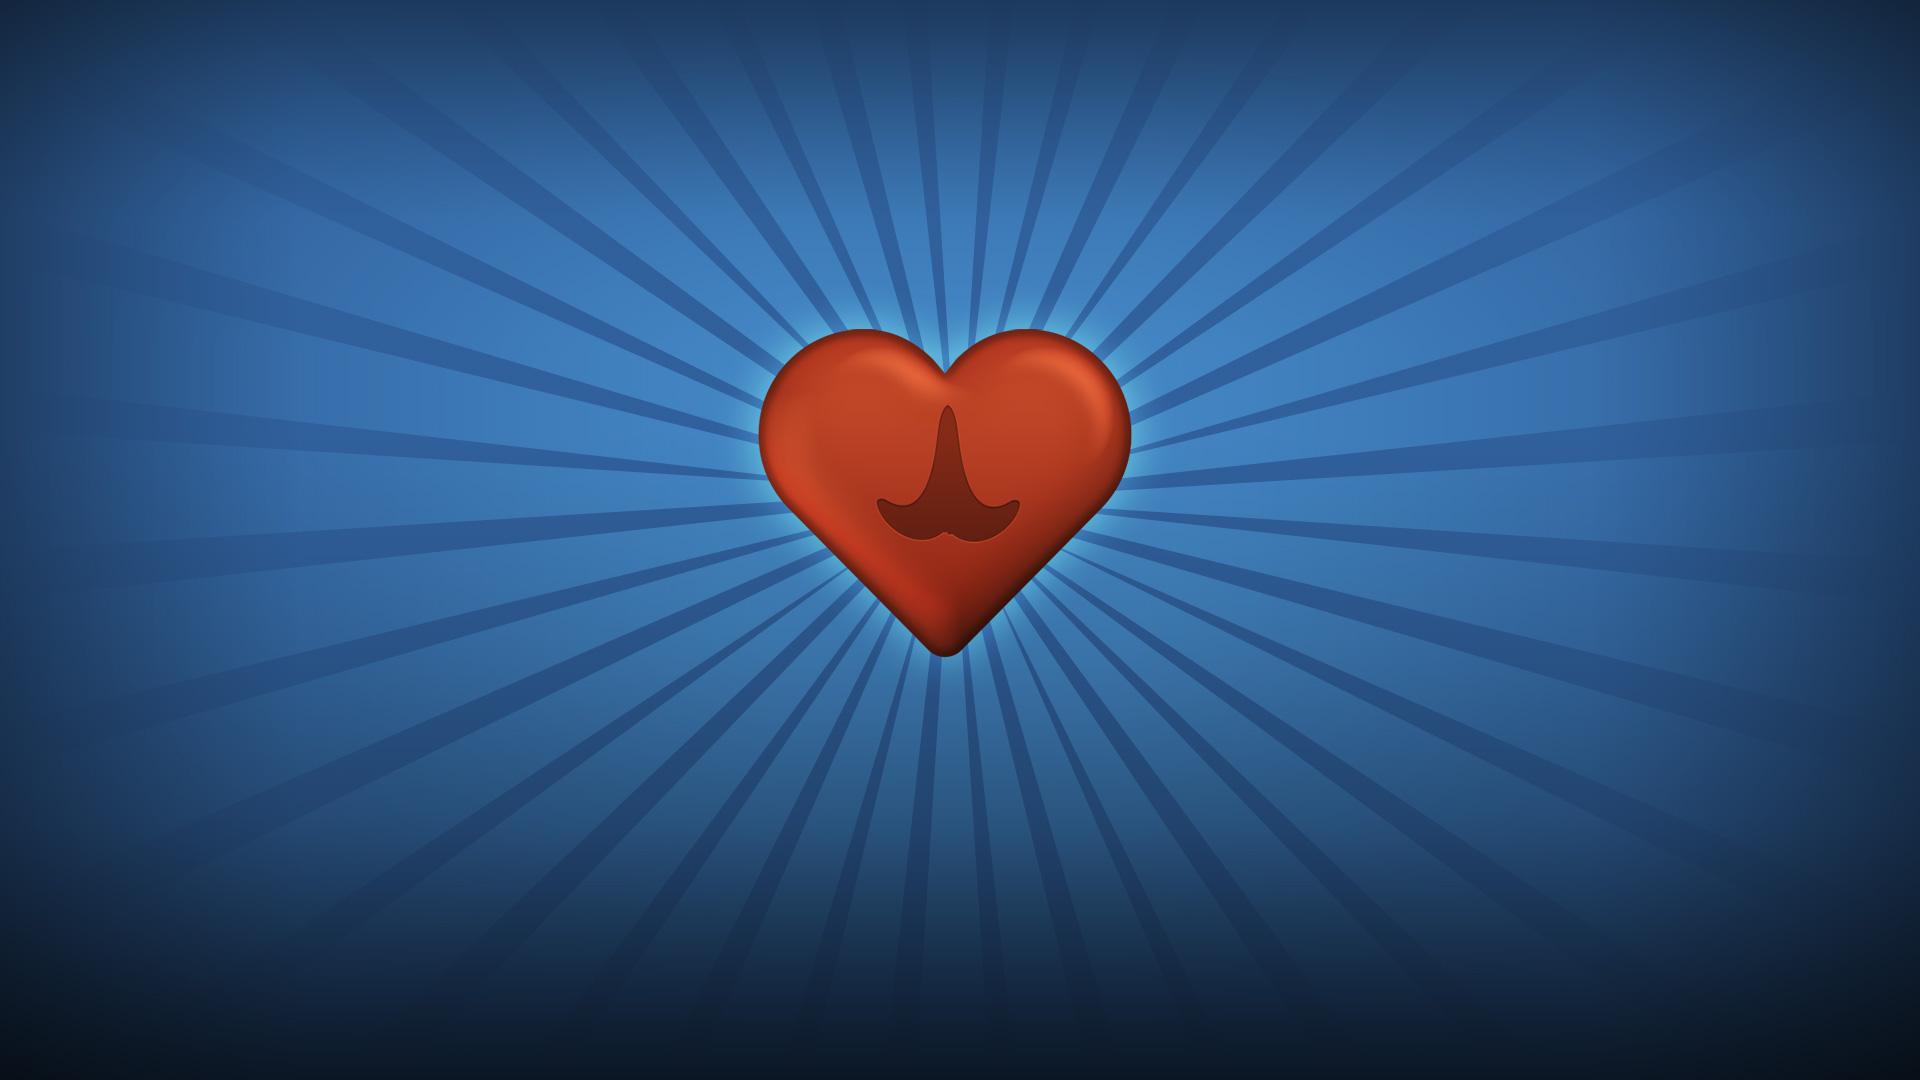 Steam Card Exchange Showcase N2o Flipper Owl Hearty Orange 4 Of 7artwork Heart